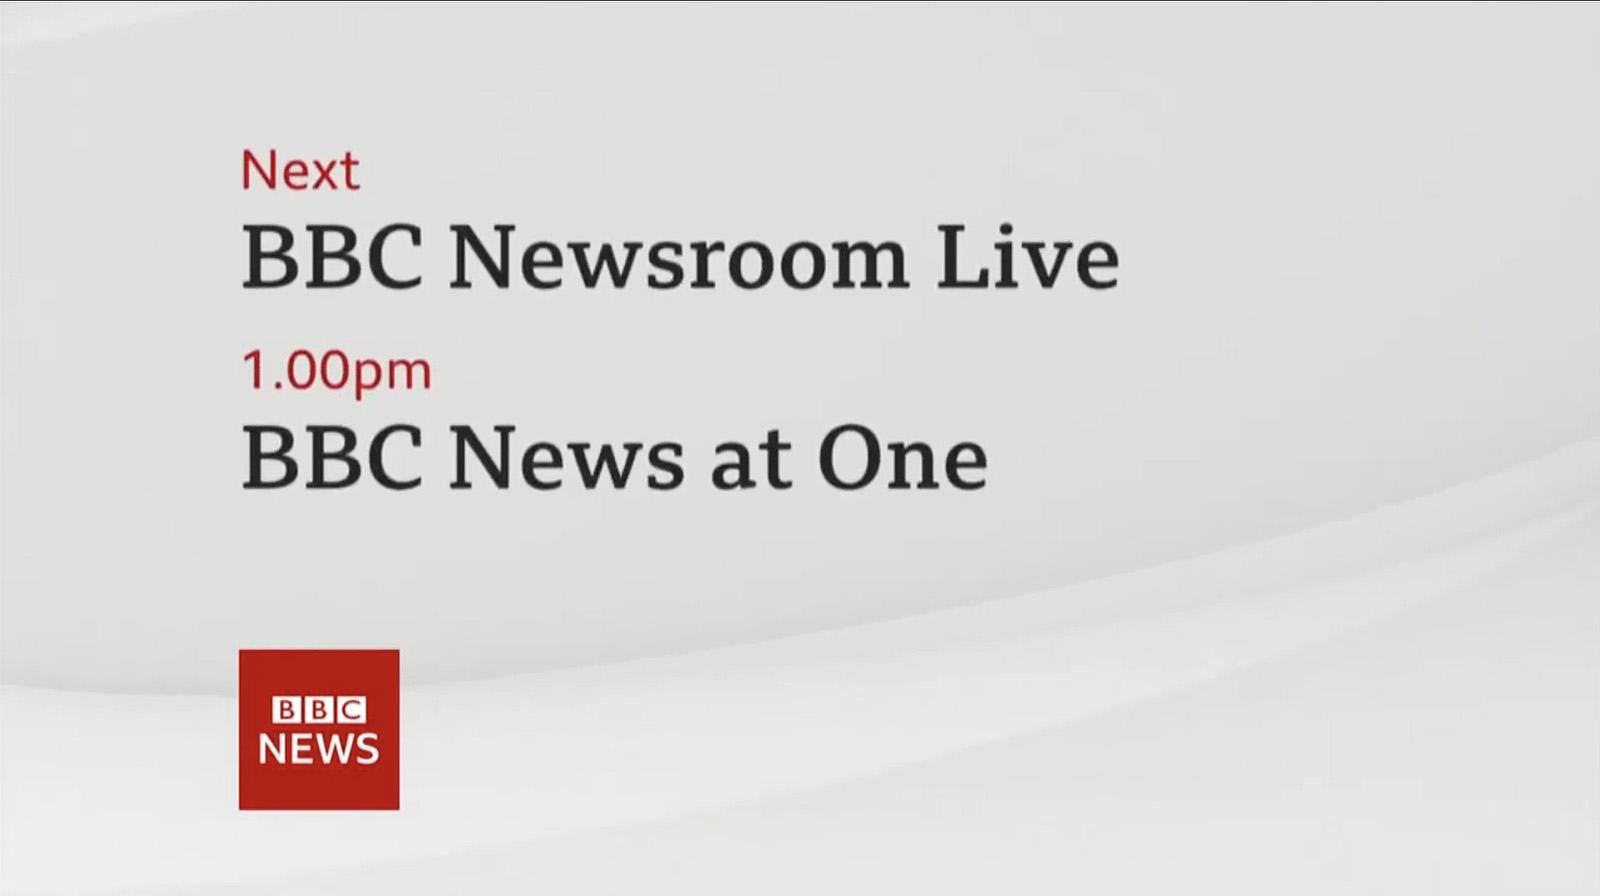 NCS_BBC-Rebrand-Reith-2019_040